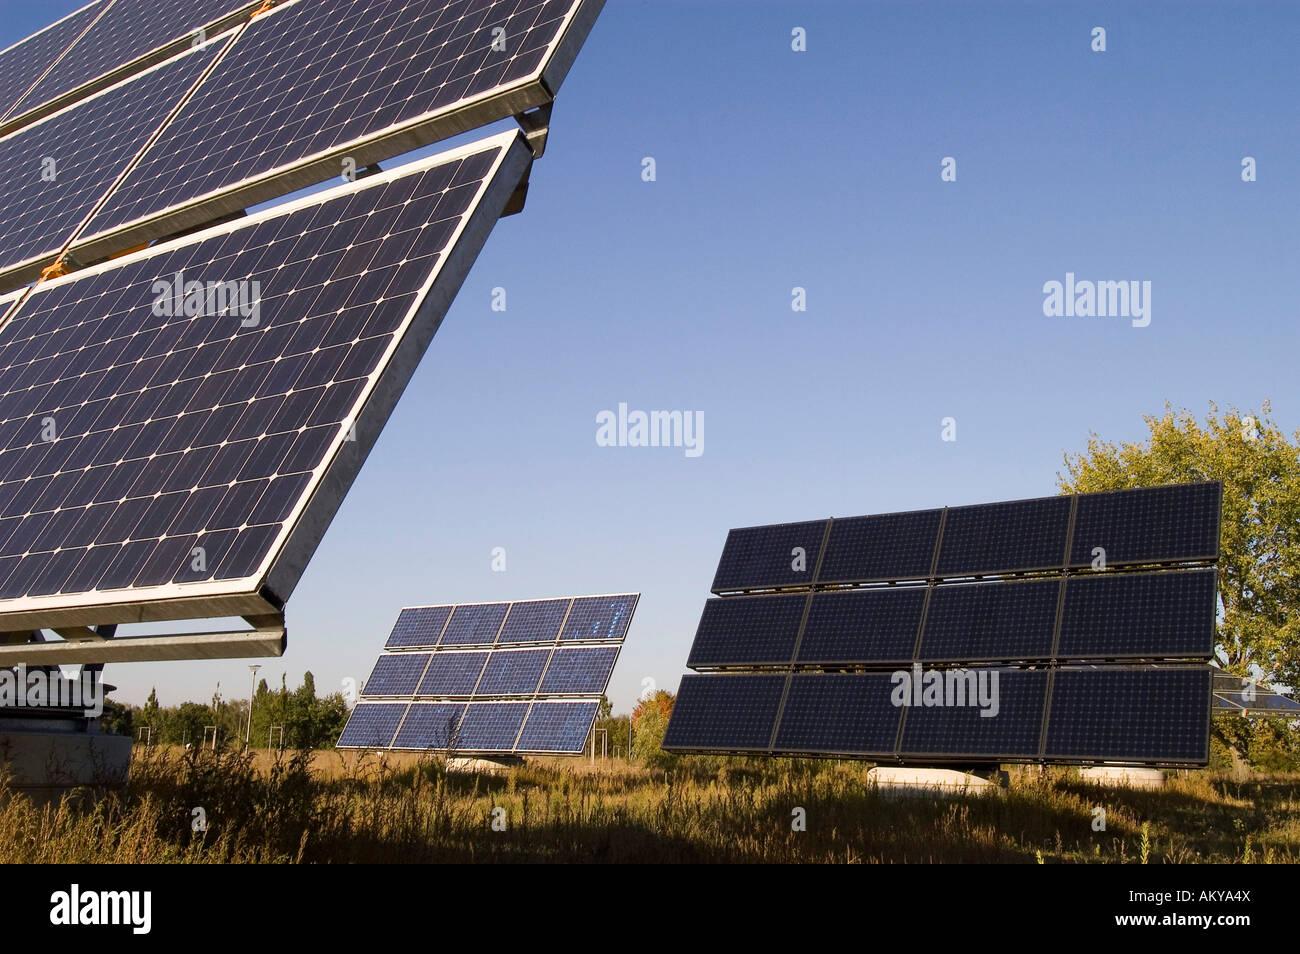 Solar modules on a testfield in Berlin, Germany - Stock Image